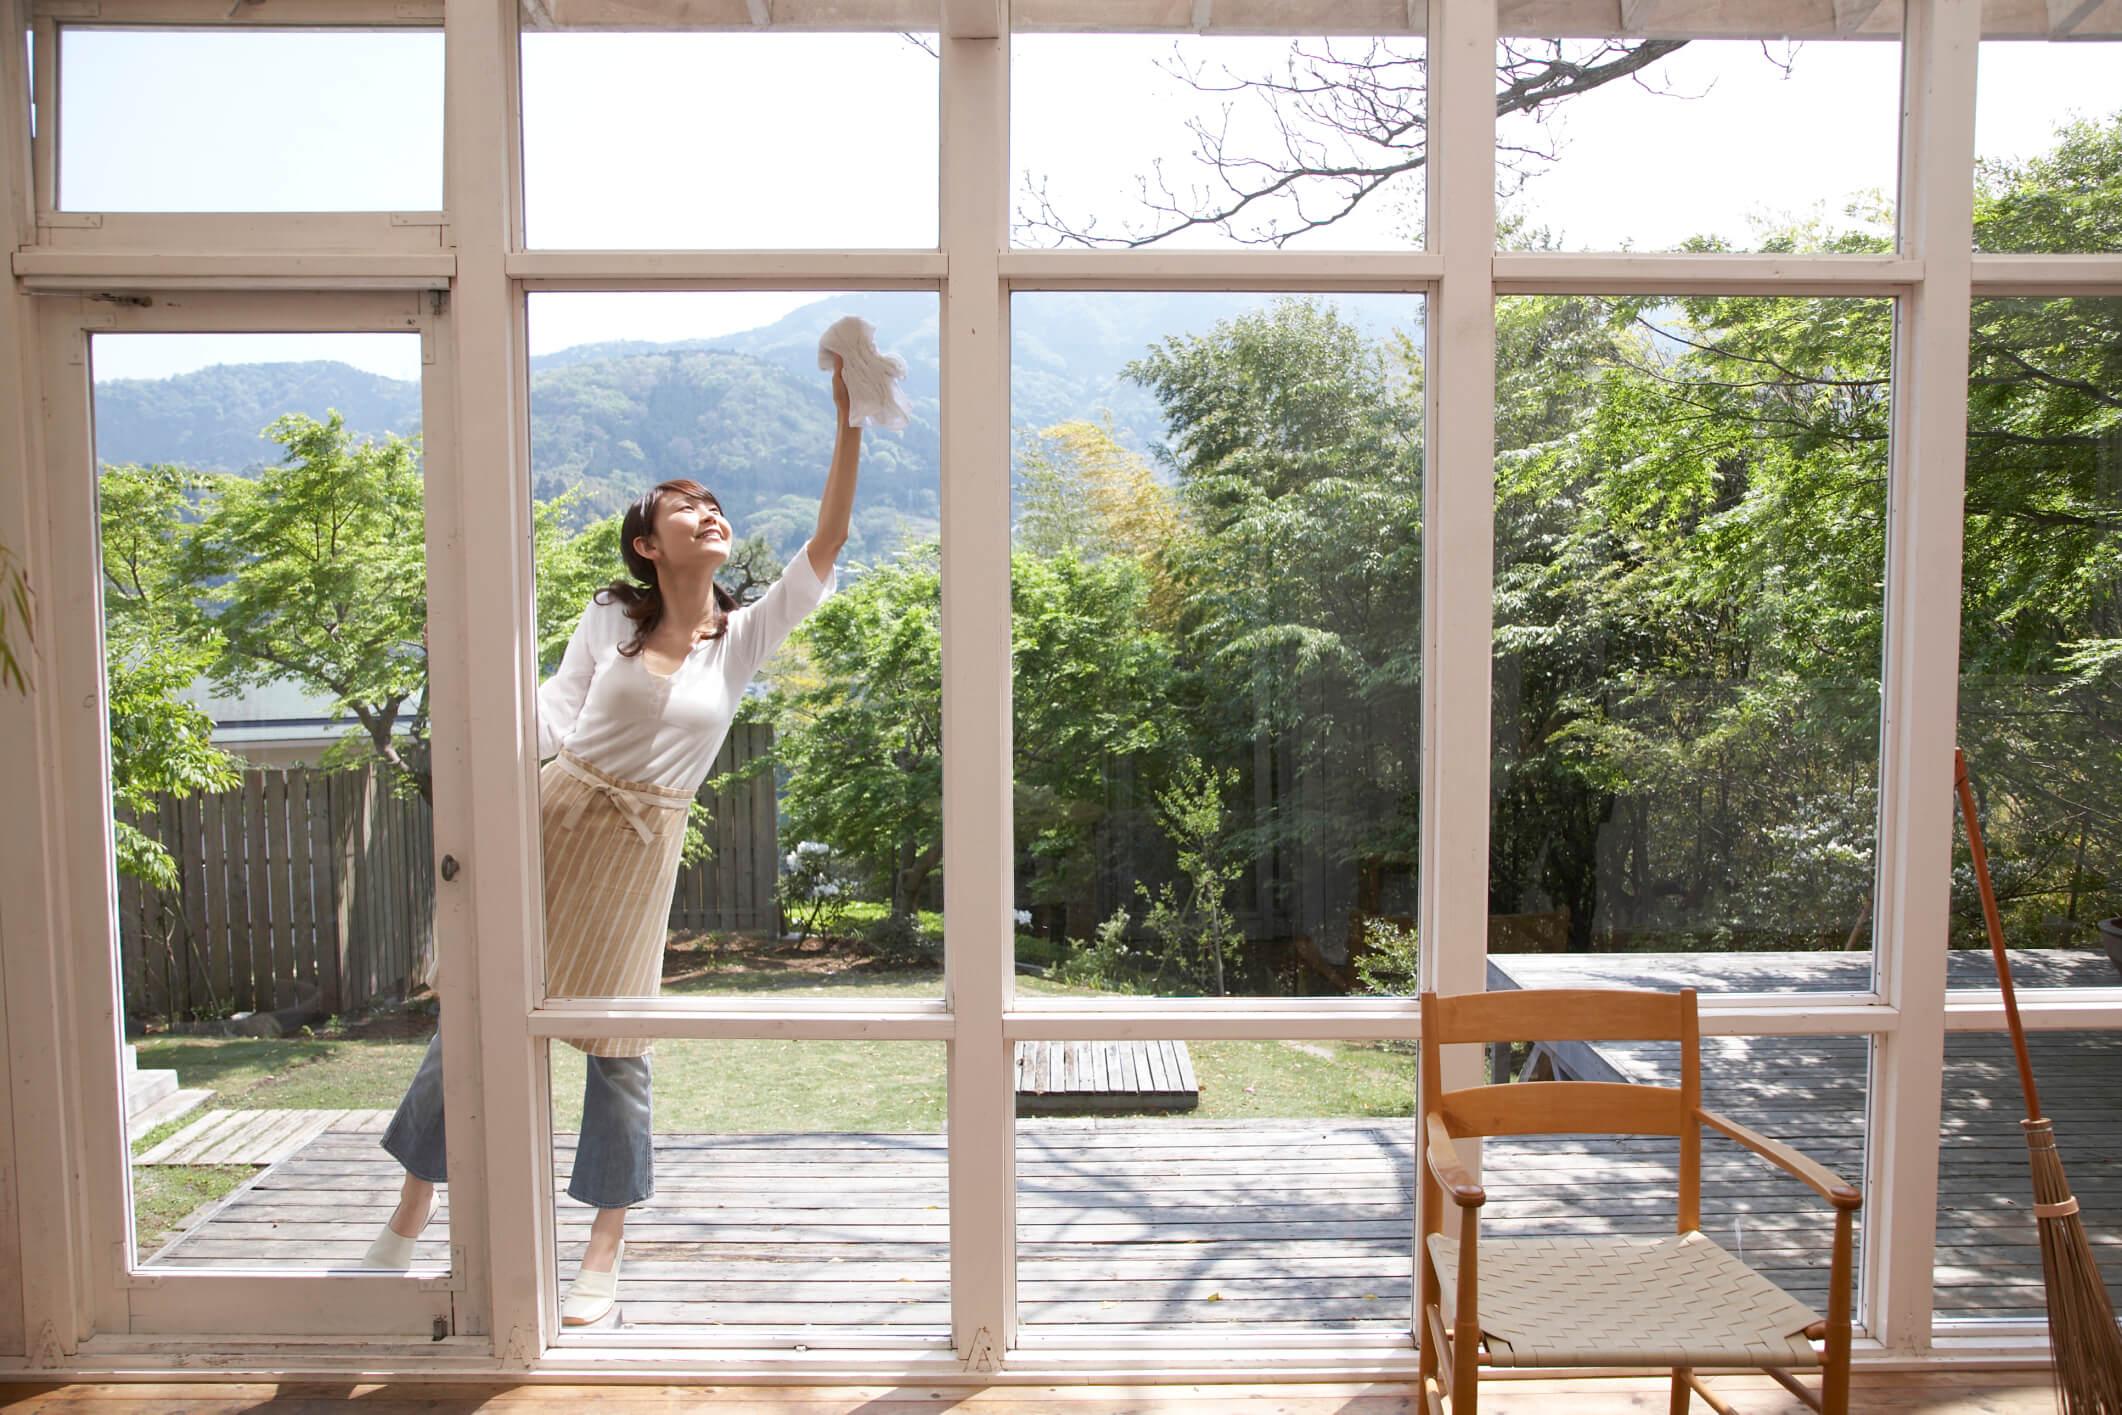 C mo limpiar vidrios de ventanas ba os y autos perfectamente - Como limpiar paredes blancas muy sucias ...